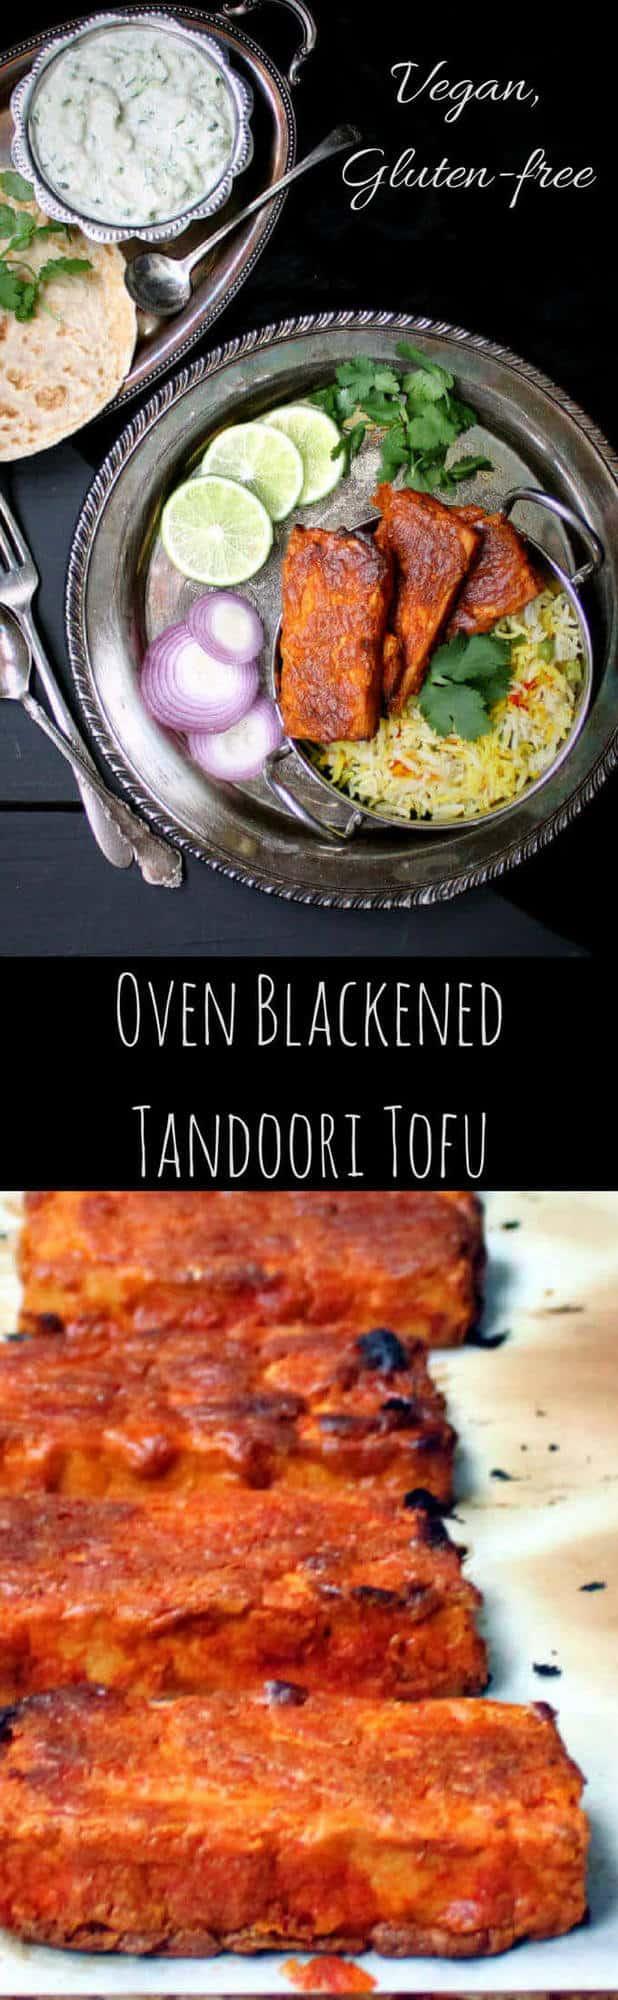 "Pin image of tofu with inlay that reads ""Oven Blackened Tandoori Tofu"""